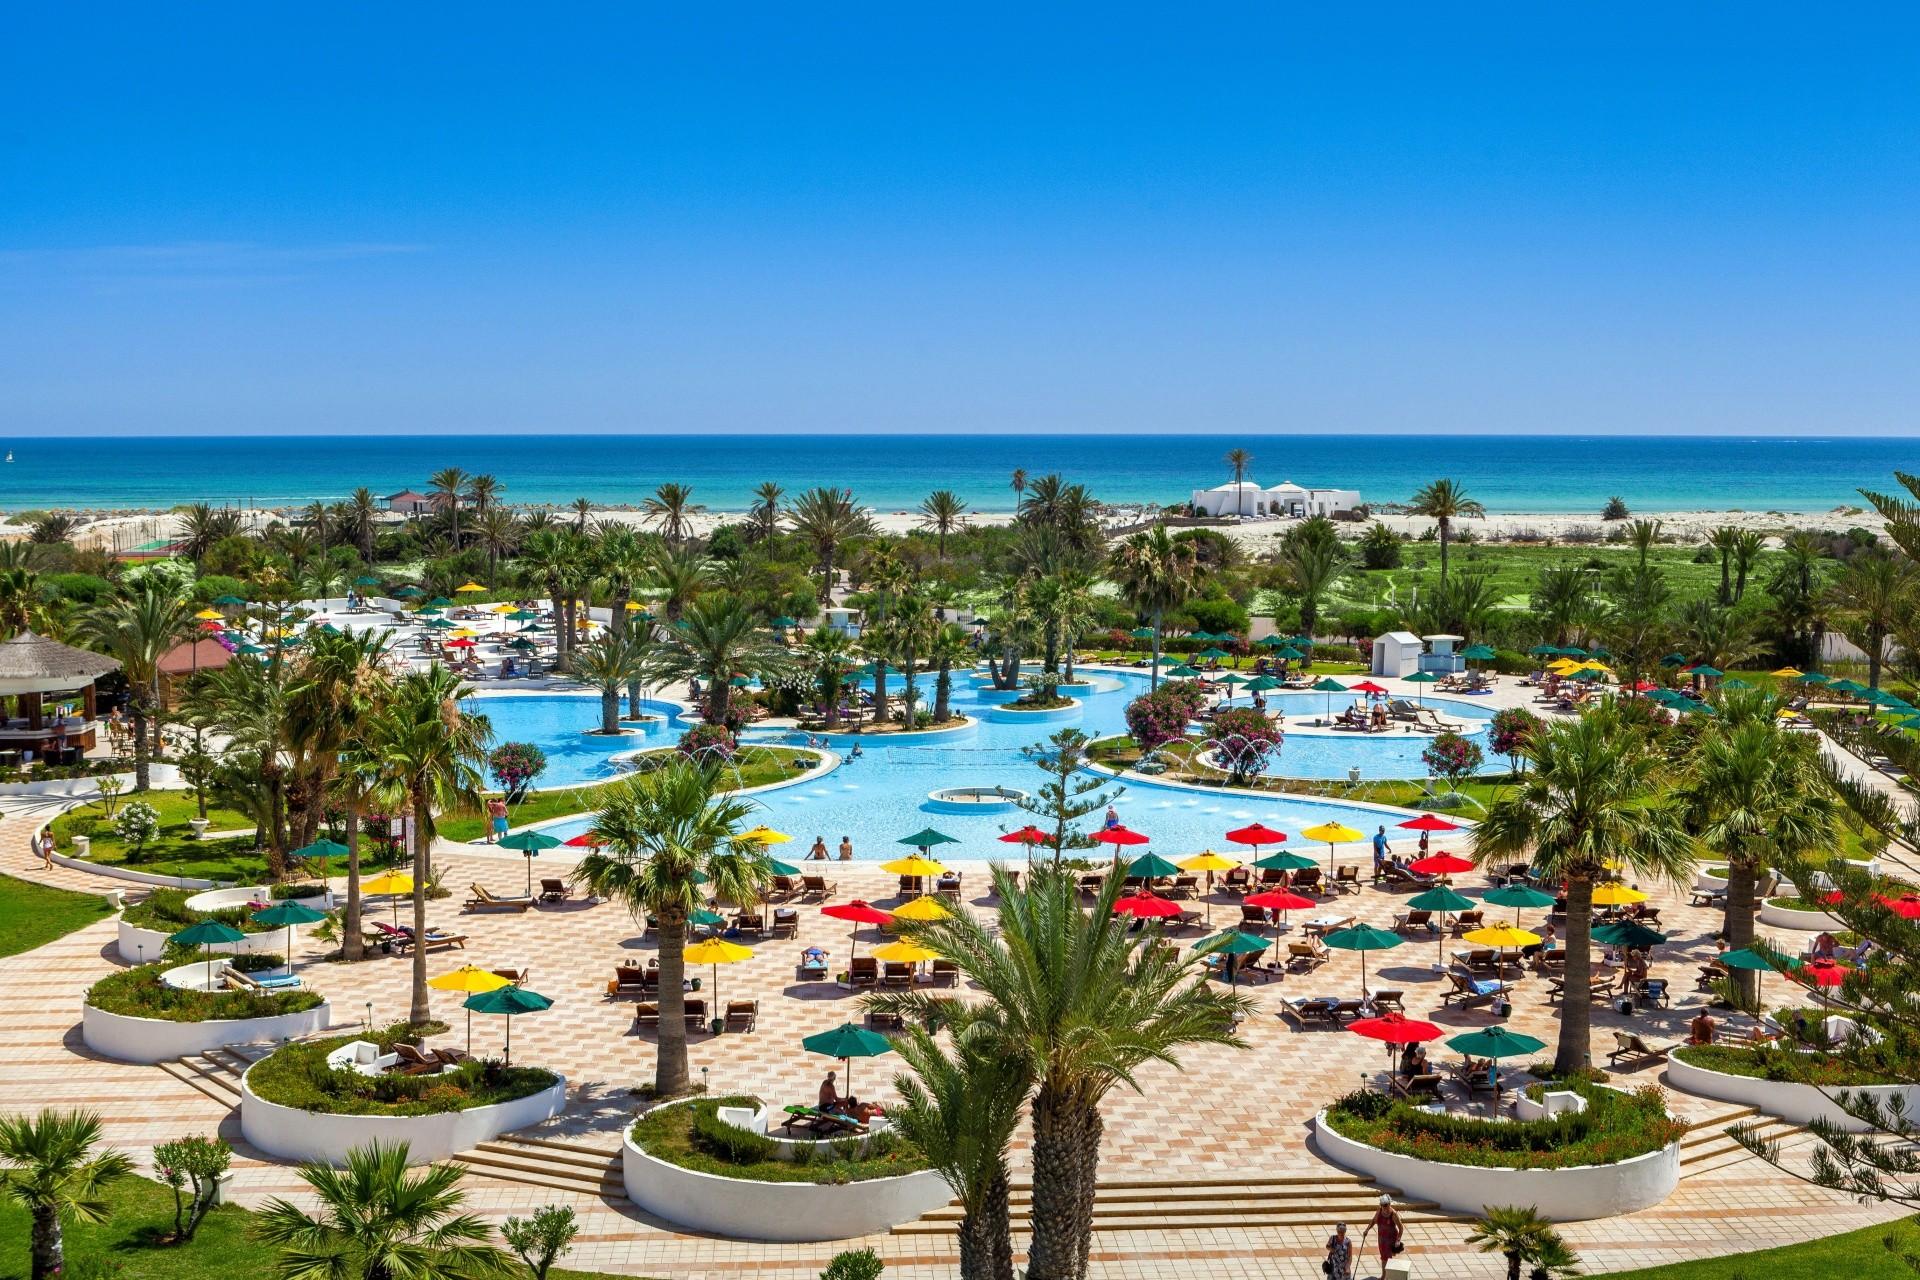 Hotel DJERBA PLAZA THALASSO & SPA 4*, Midoun